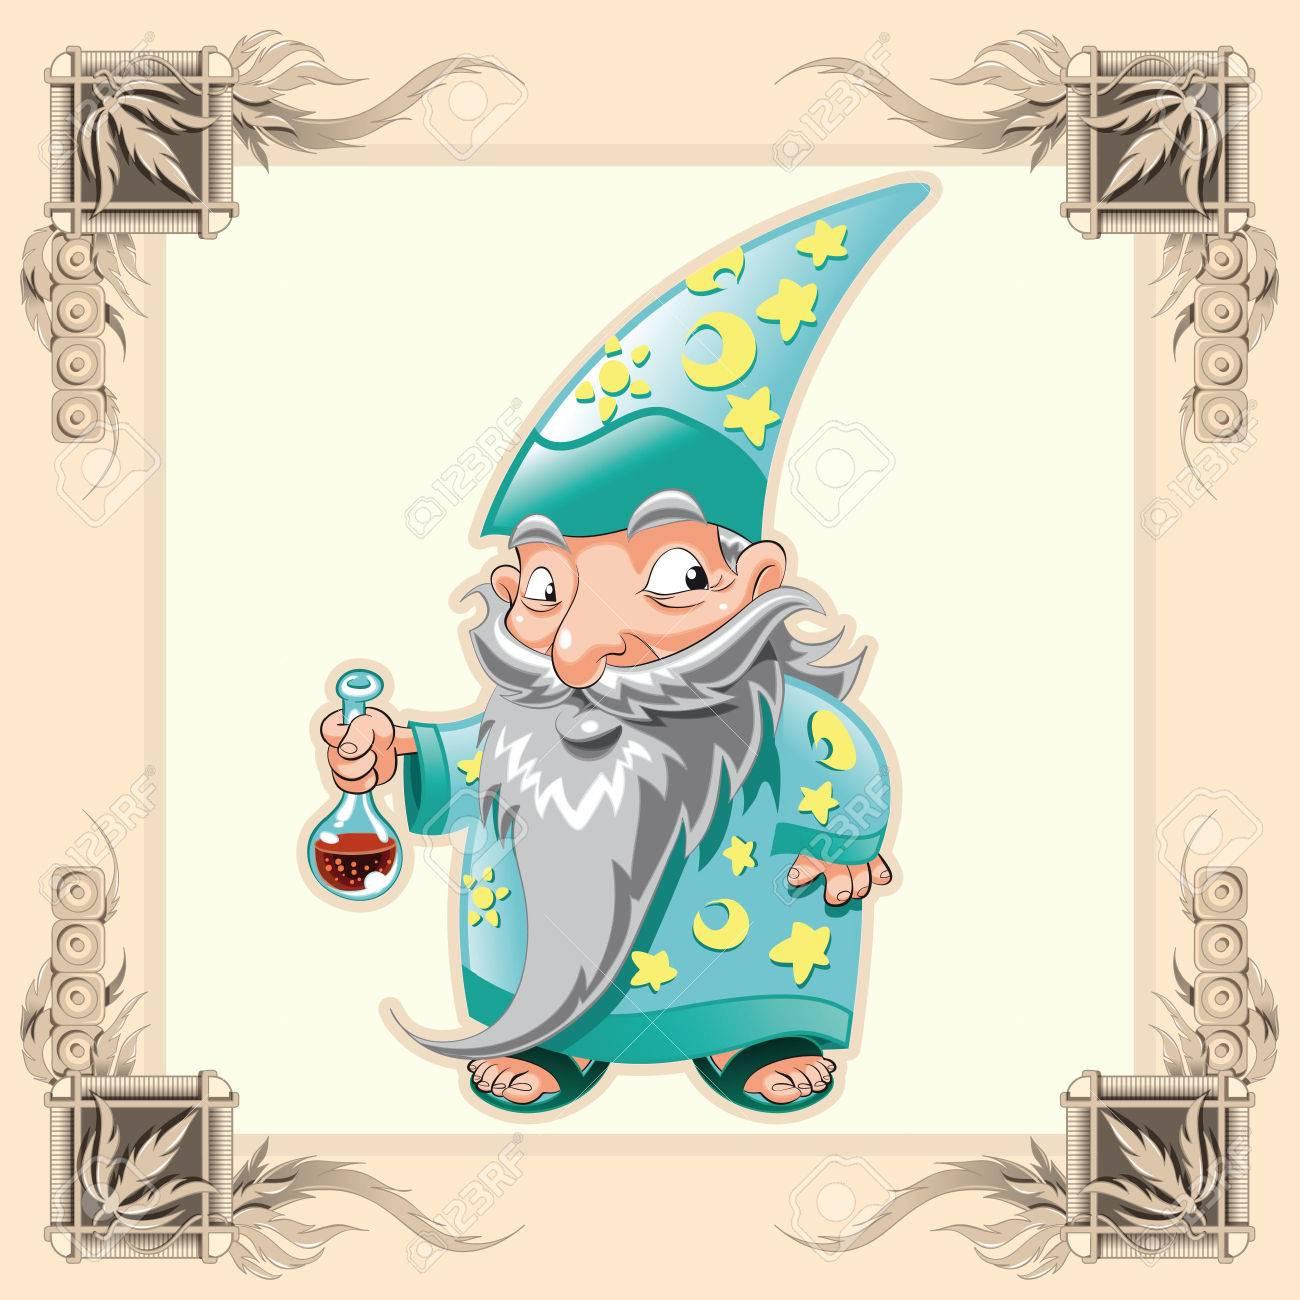 Funny Magician. Cartoon and vector illustration. Stock Vector - 5877632